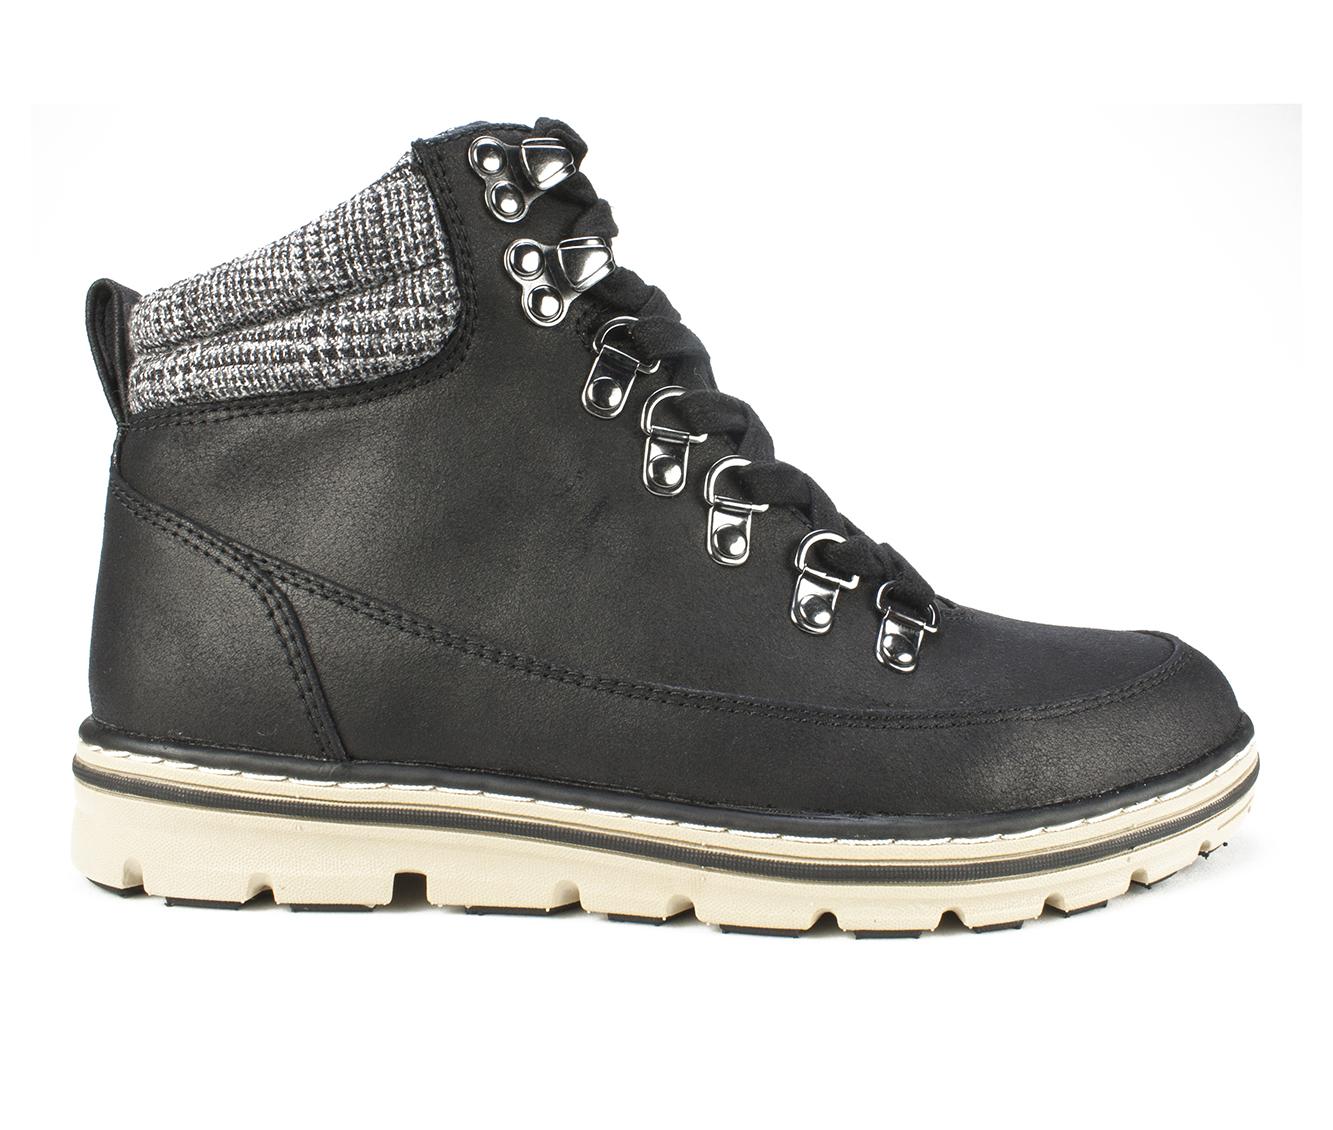 Cliffs Karmen Women's Boot (Black Faux Leather)